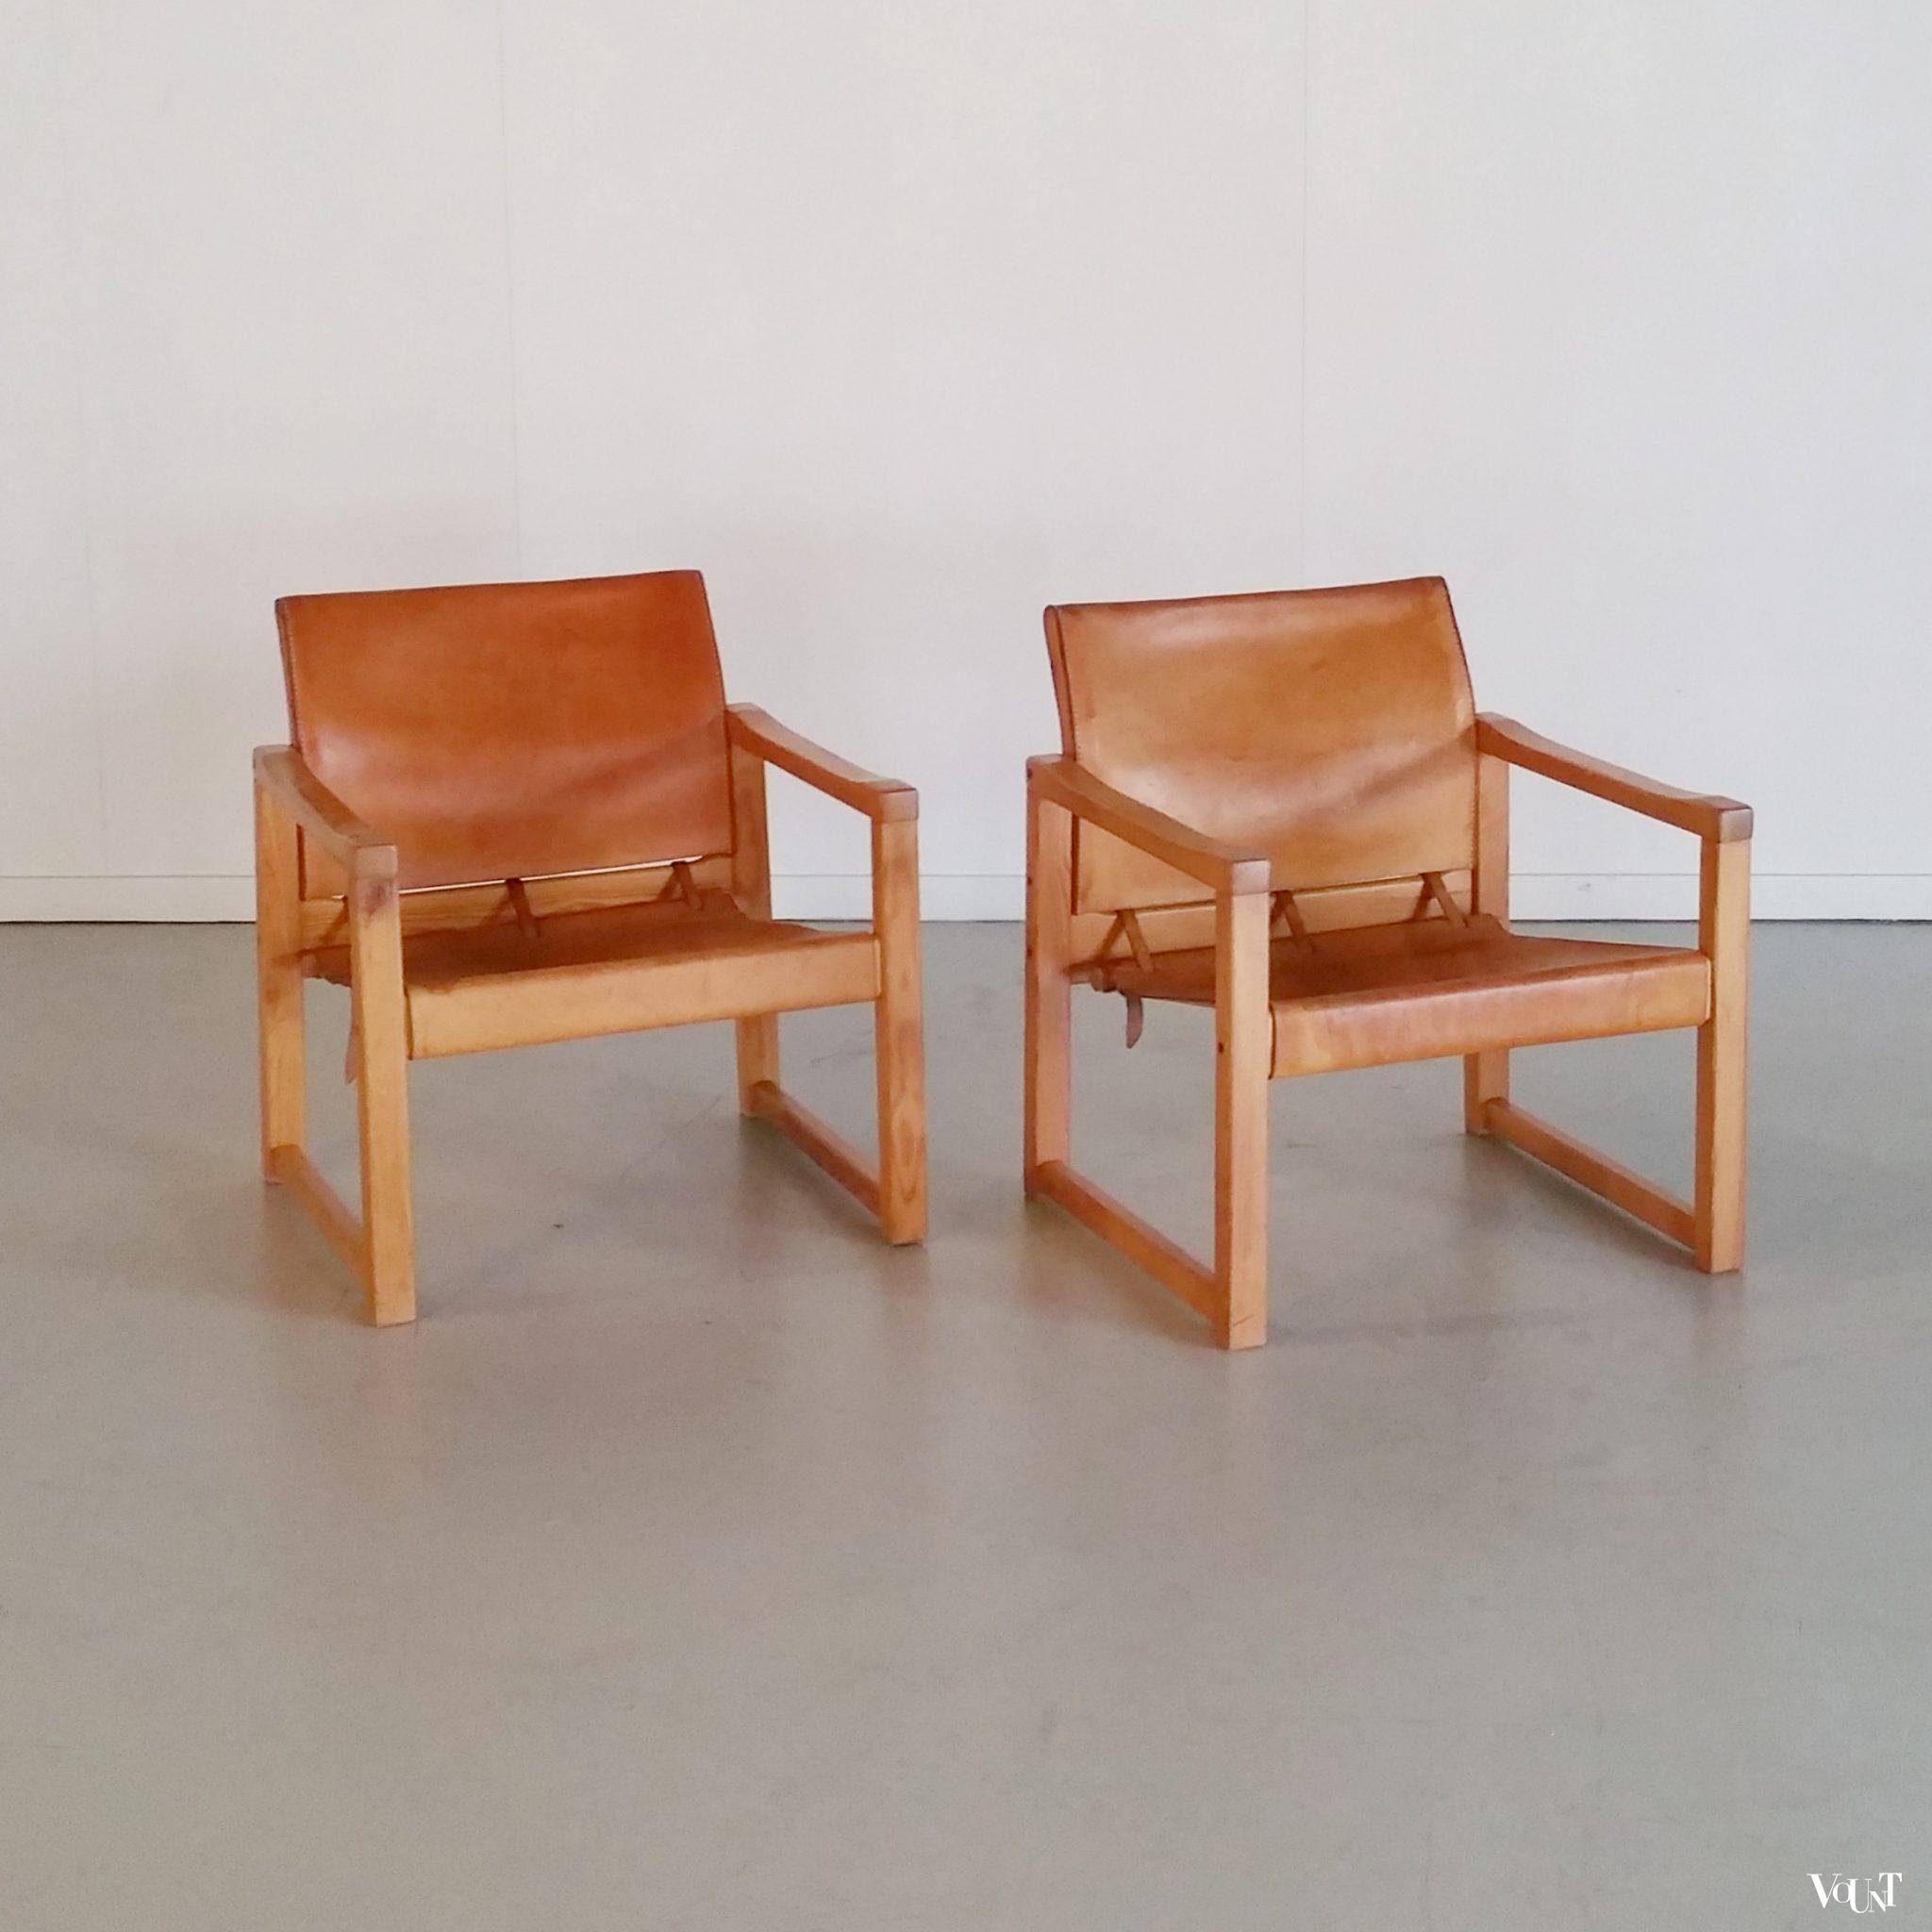 2 Leren Stoeltjes.2 Leren Safaristoelen Diana Karin Mobring Zweden Jaren 70